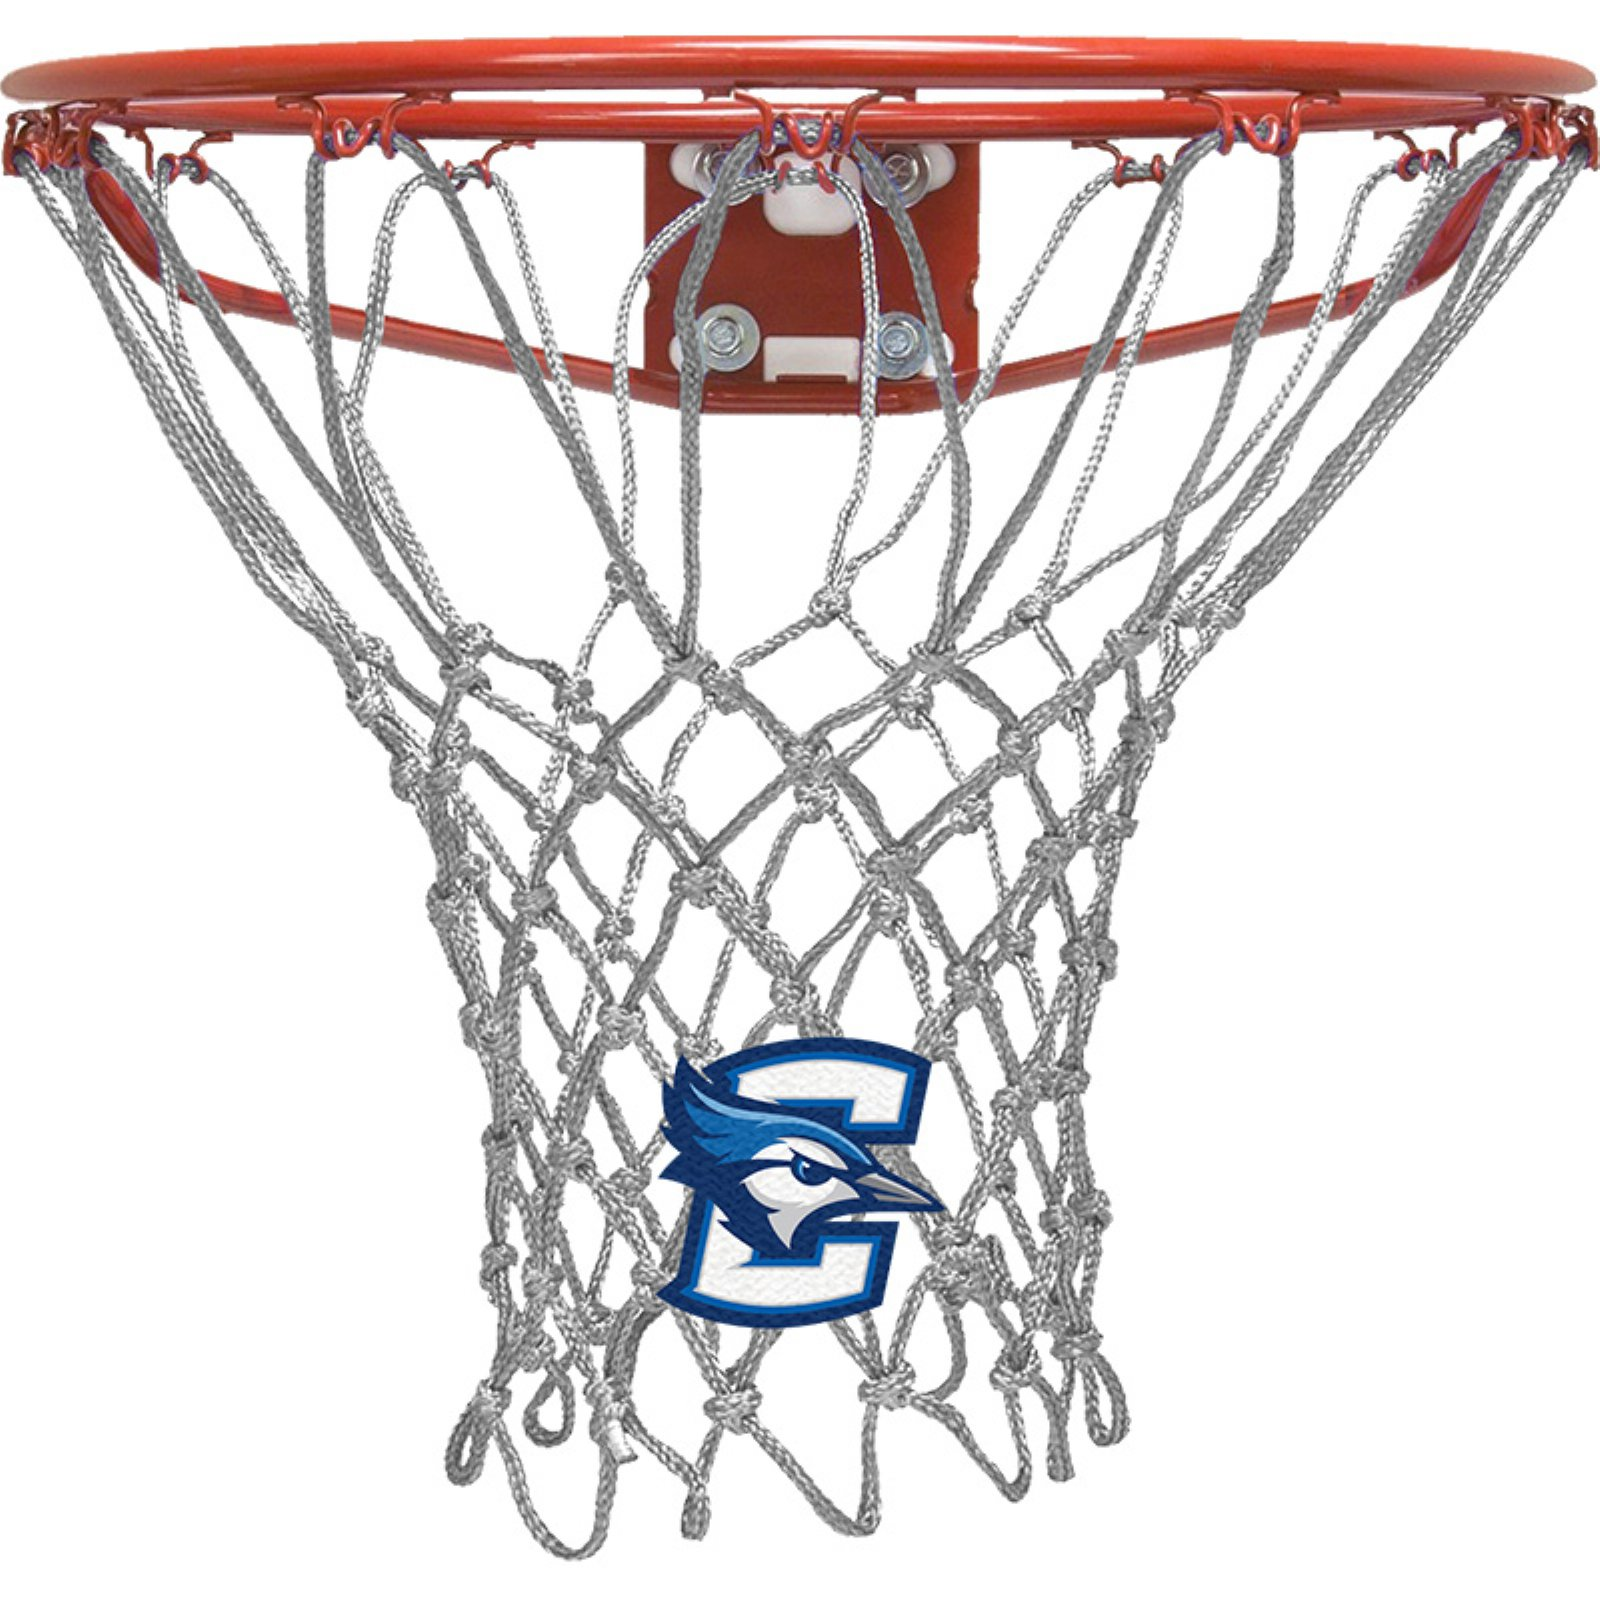 Krazy Netz Creighton University Blue Basketball Net